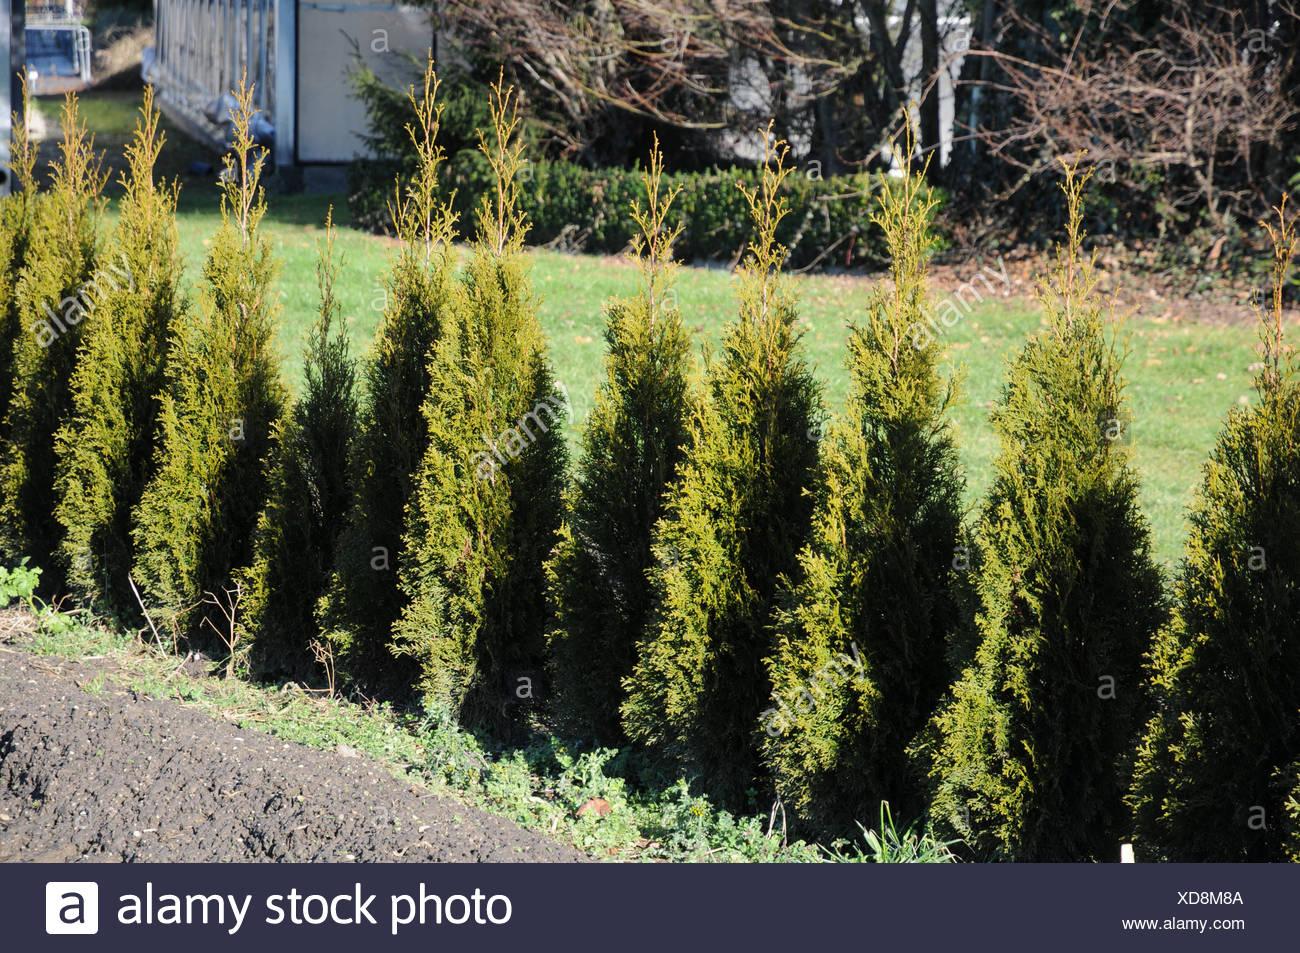 Thuja occidentalis Smaragd, hedge - Stock Image